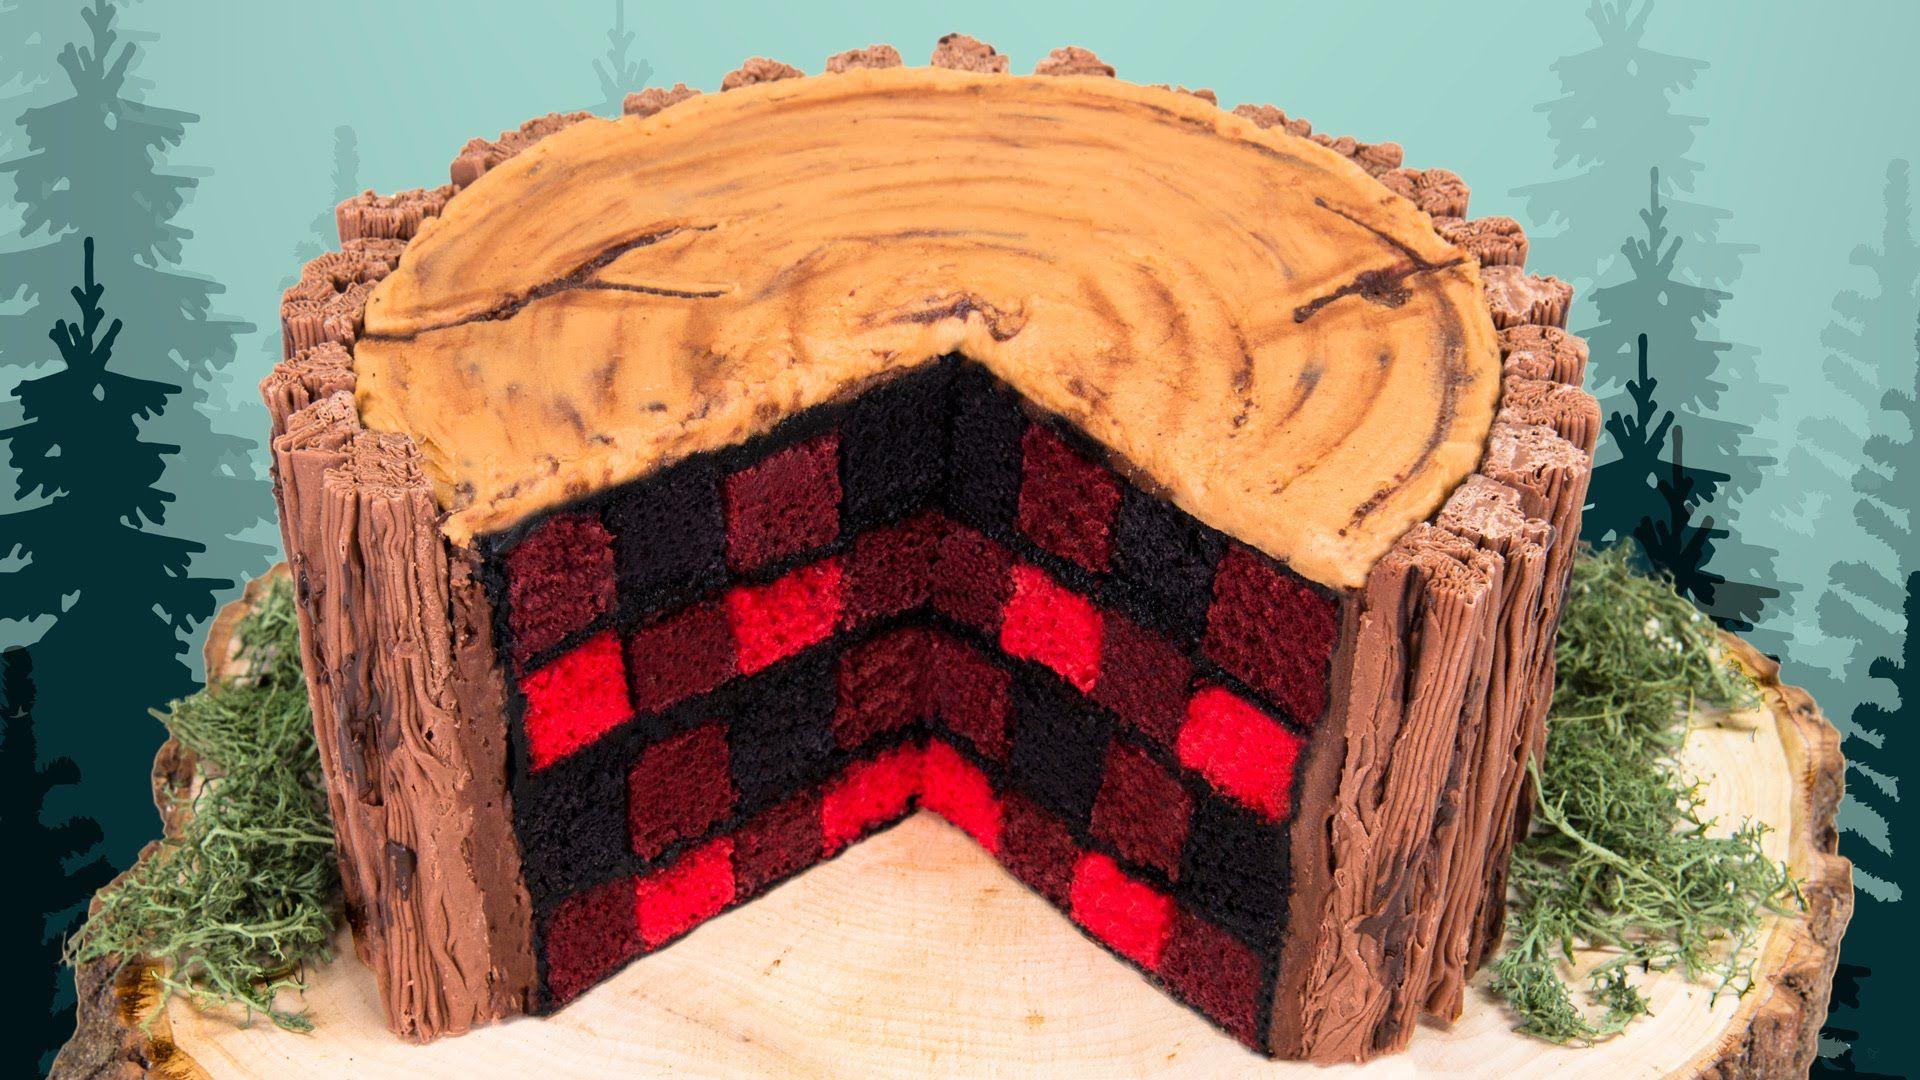 Flannel shirt cake  How to Make a Lumberjack Cake  Babyus st Birthday  Pinterest